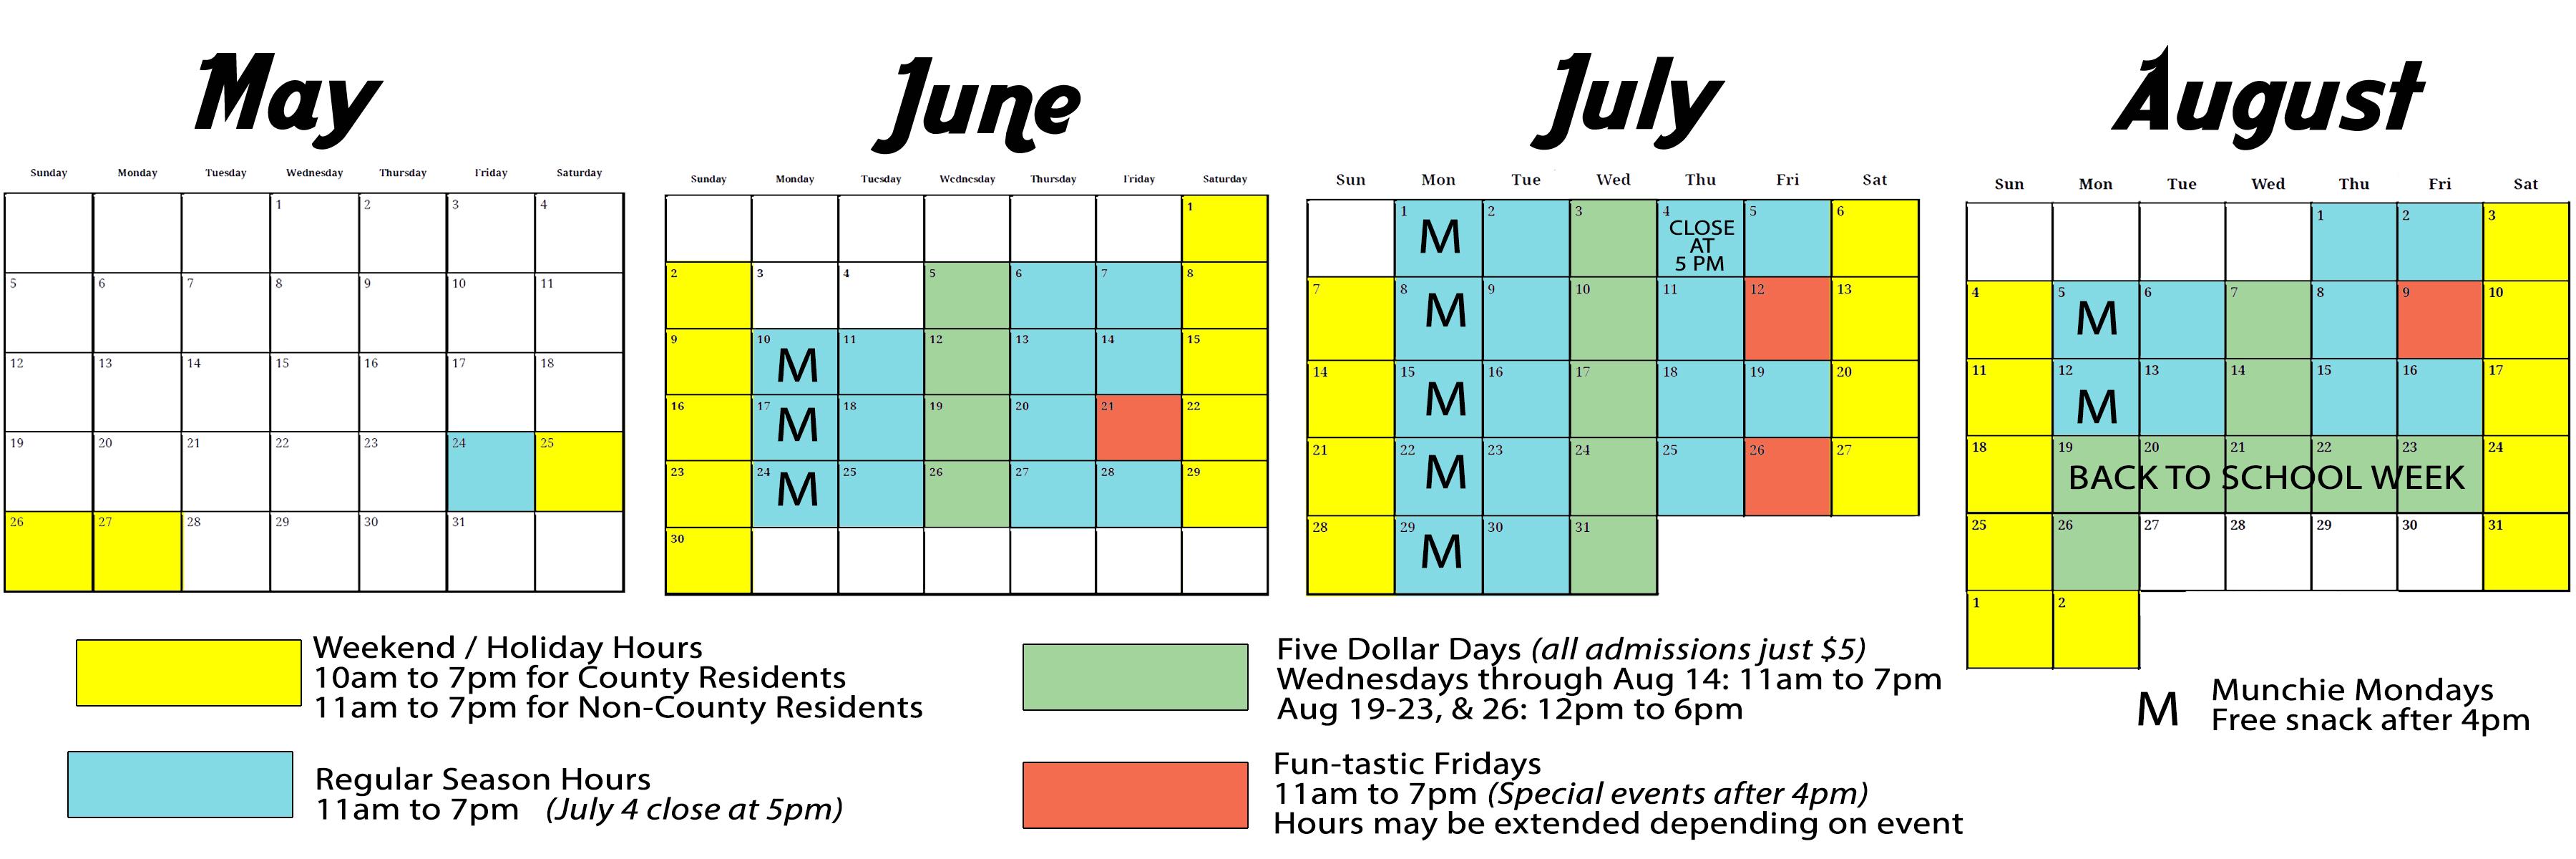 Calendar Revision Planner : Revision calendar new template site